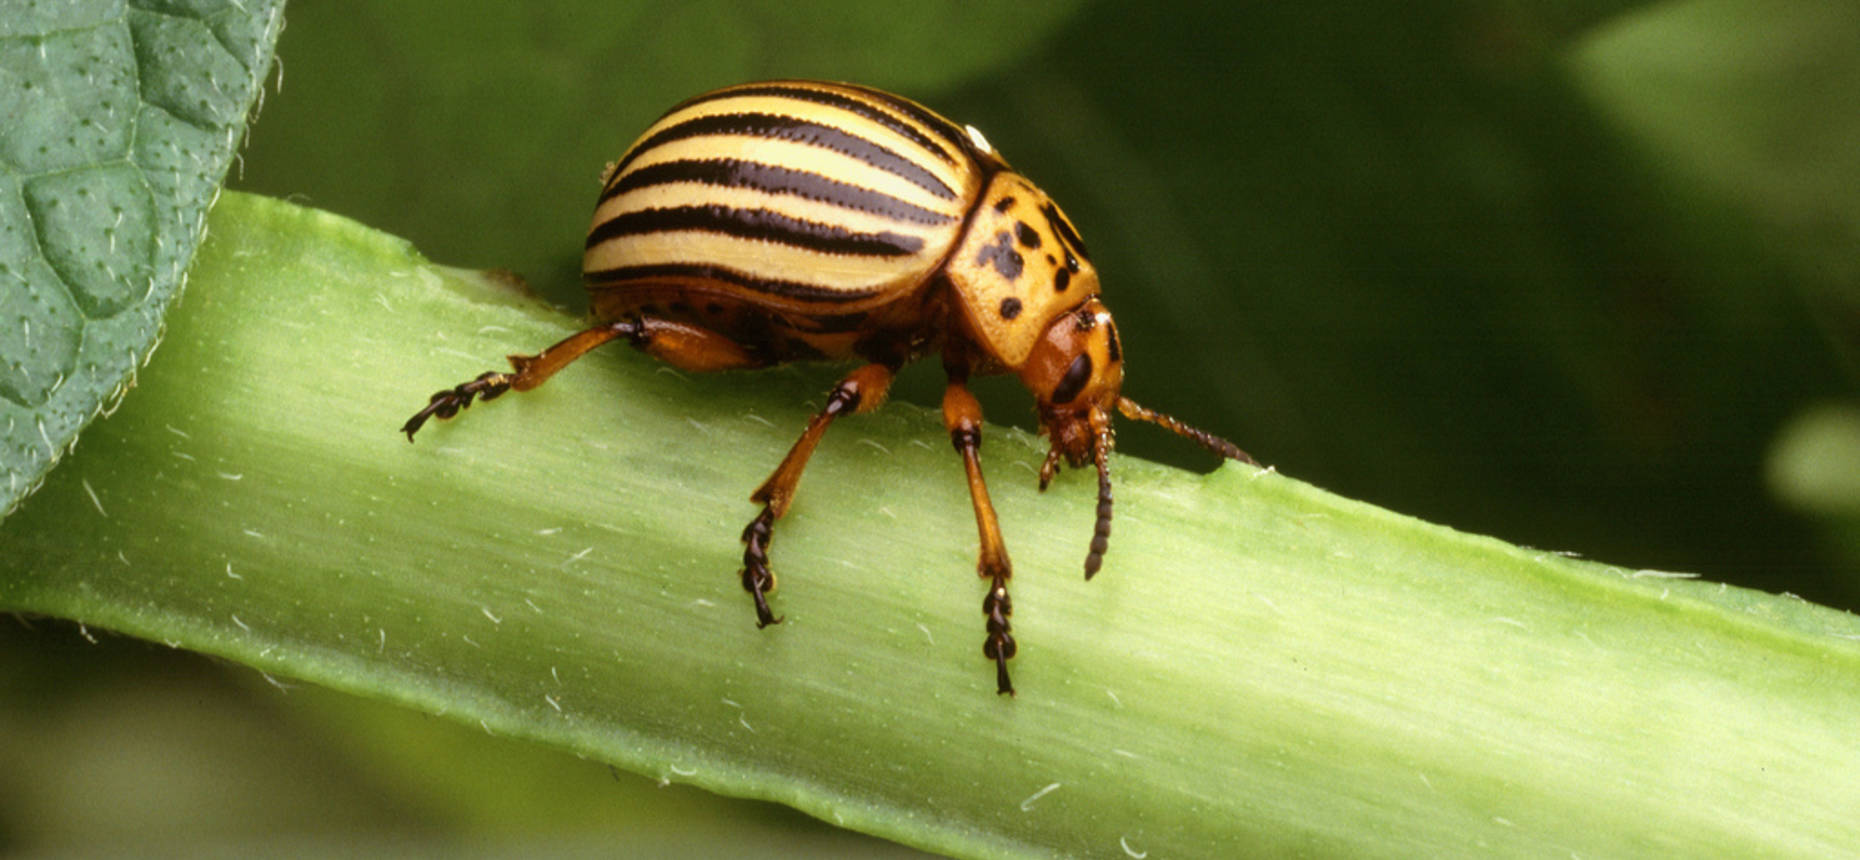 Колорадский жук - Leptinotarsa decemlineata Say